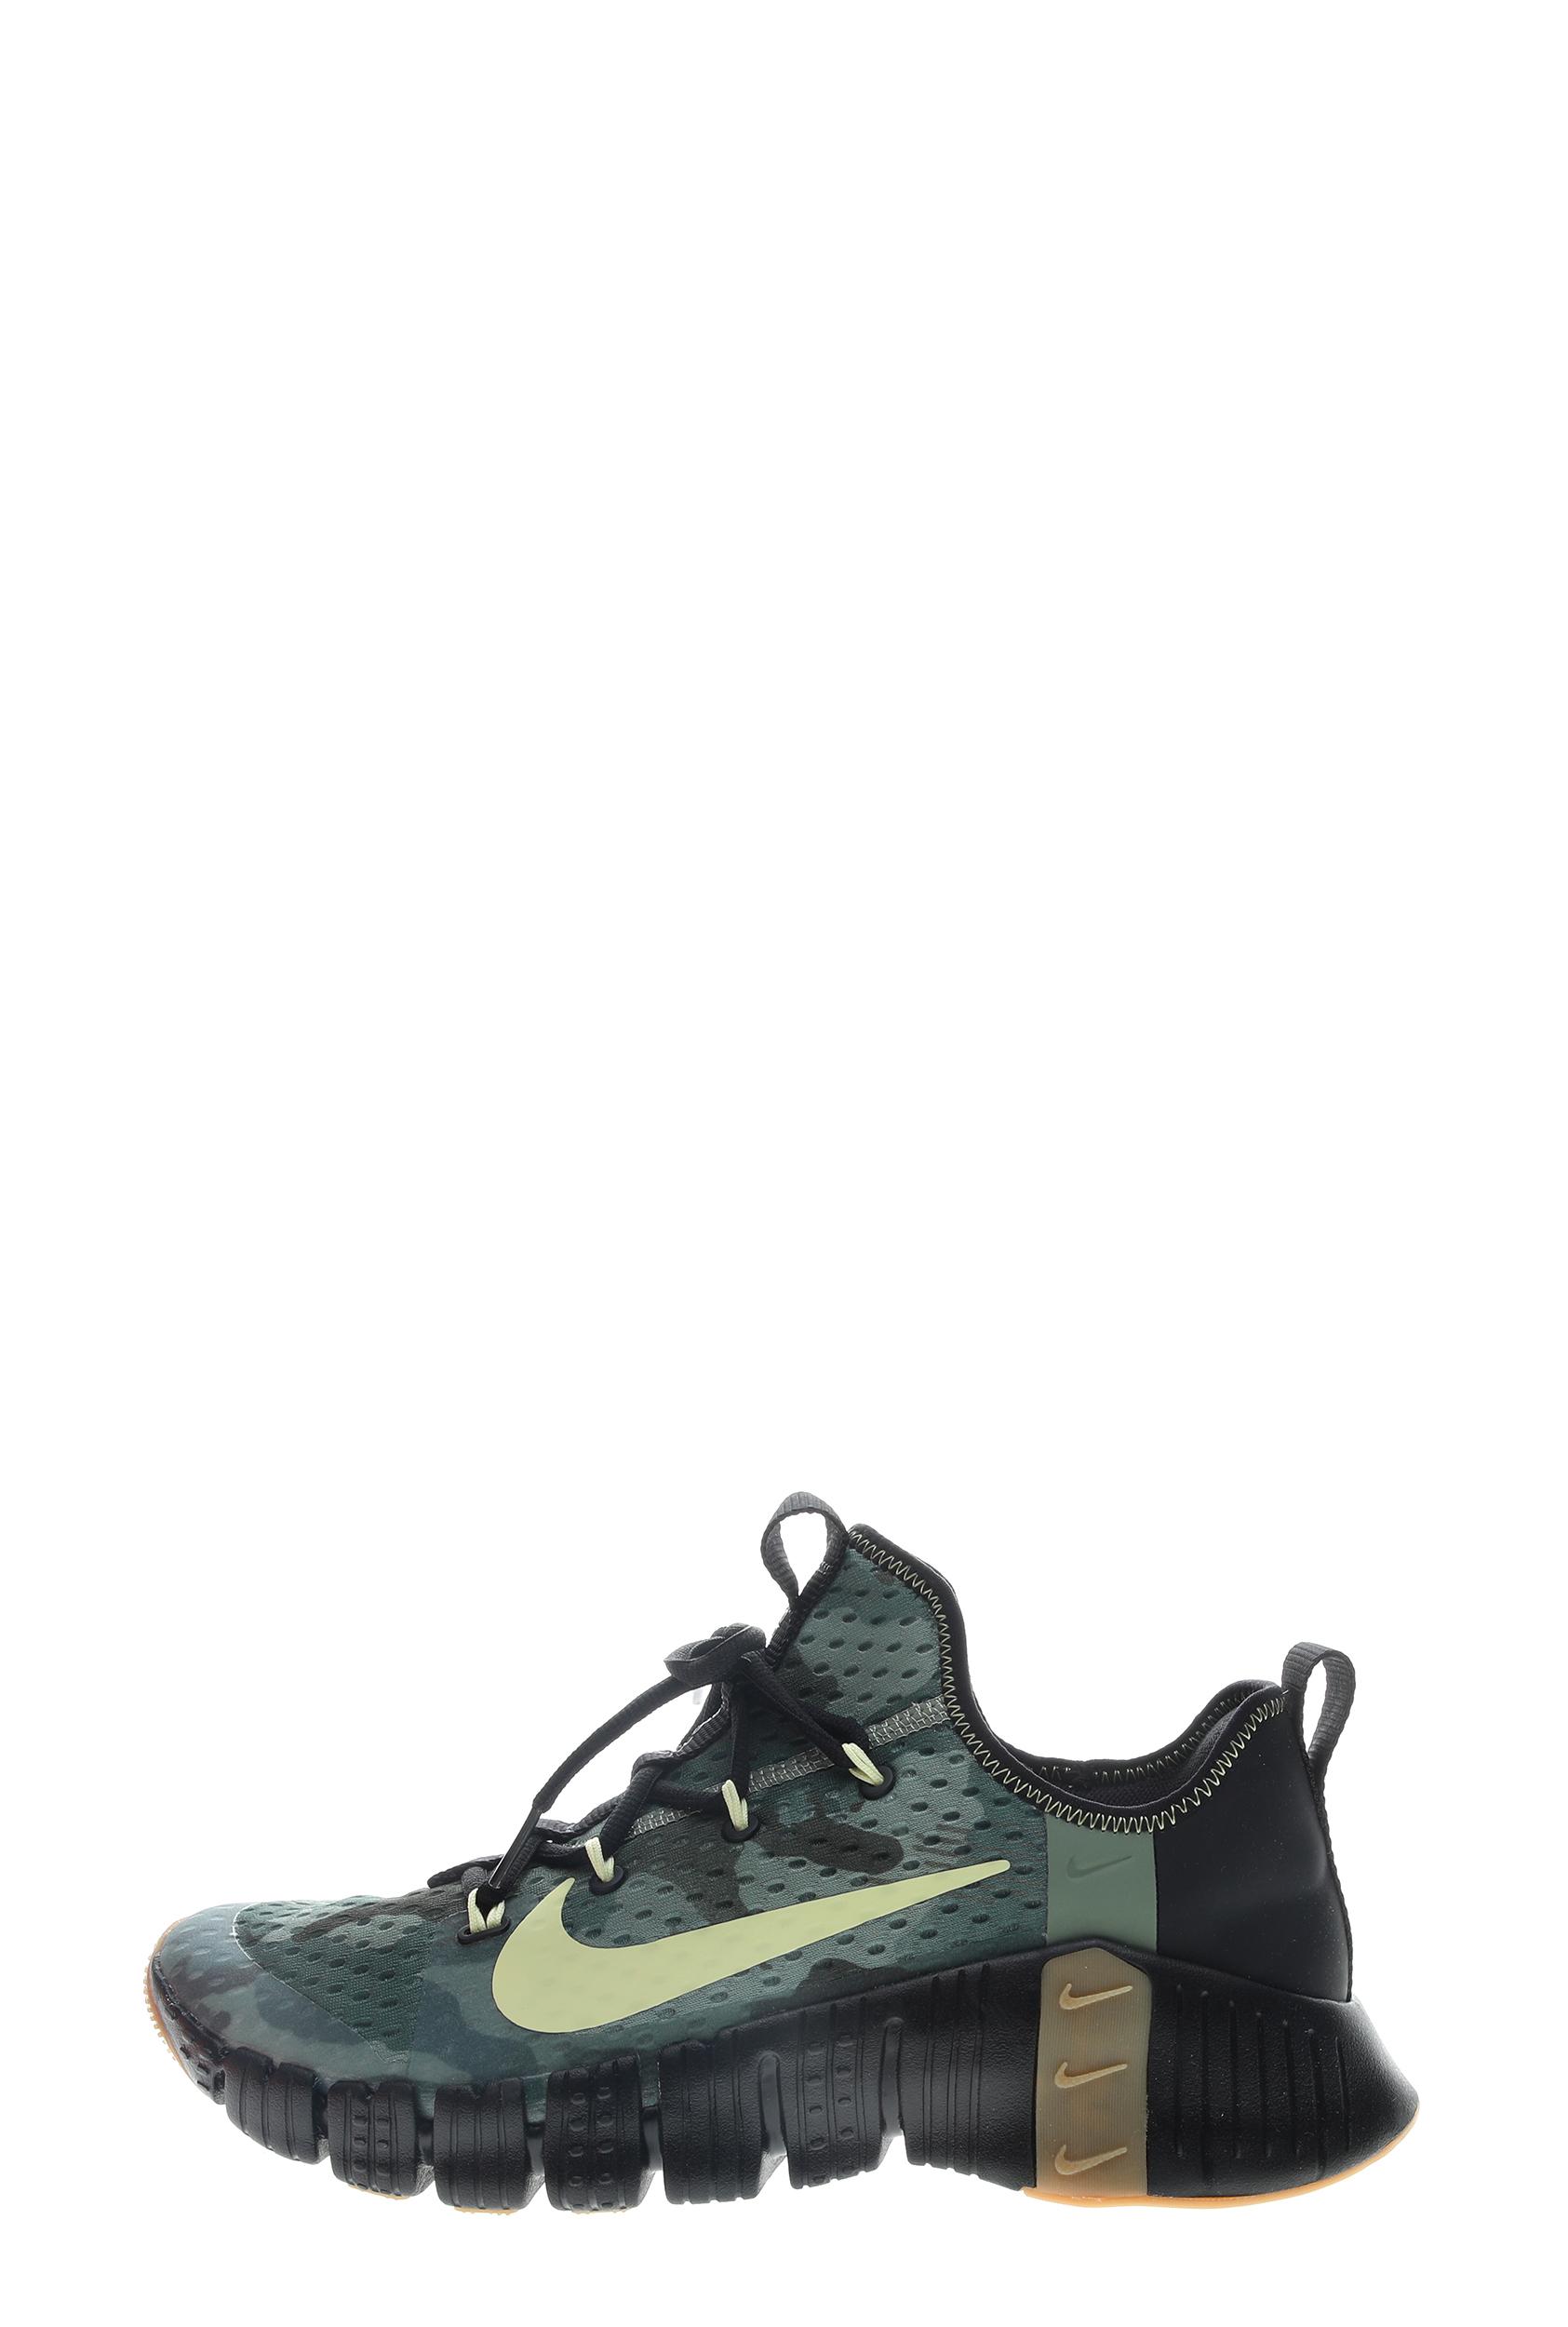 NIKE – Unisex παπούτσια training NIKE Free Metcon 3 ανθρακί χακί